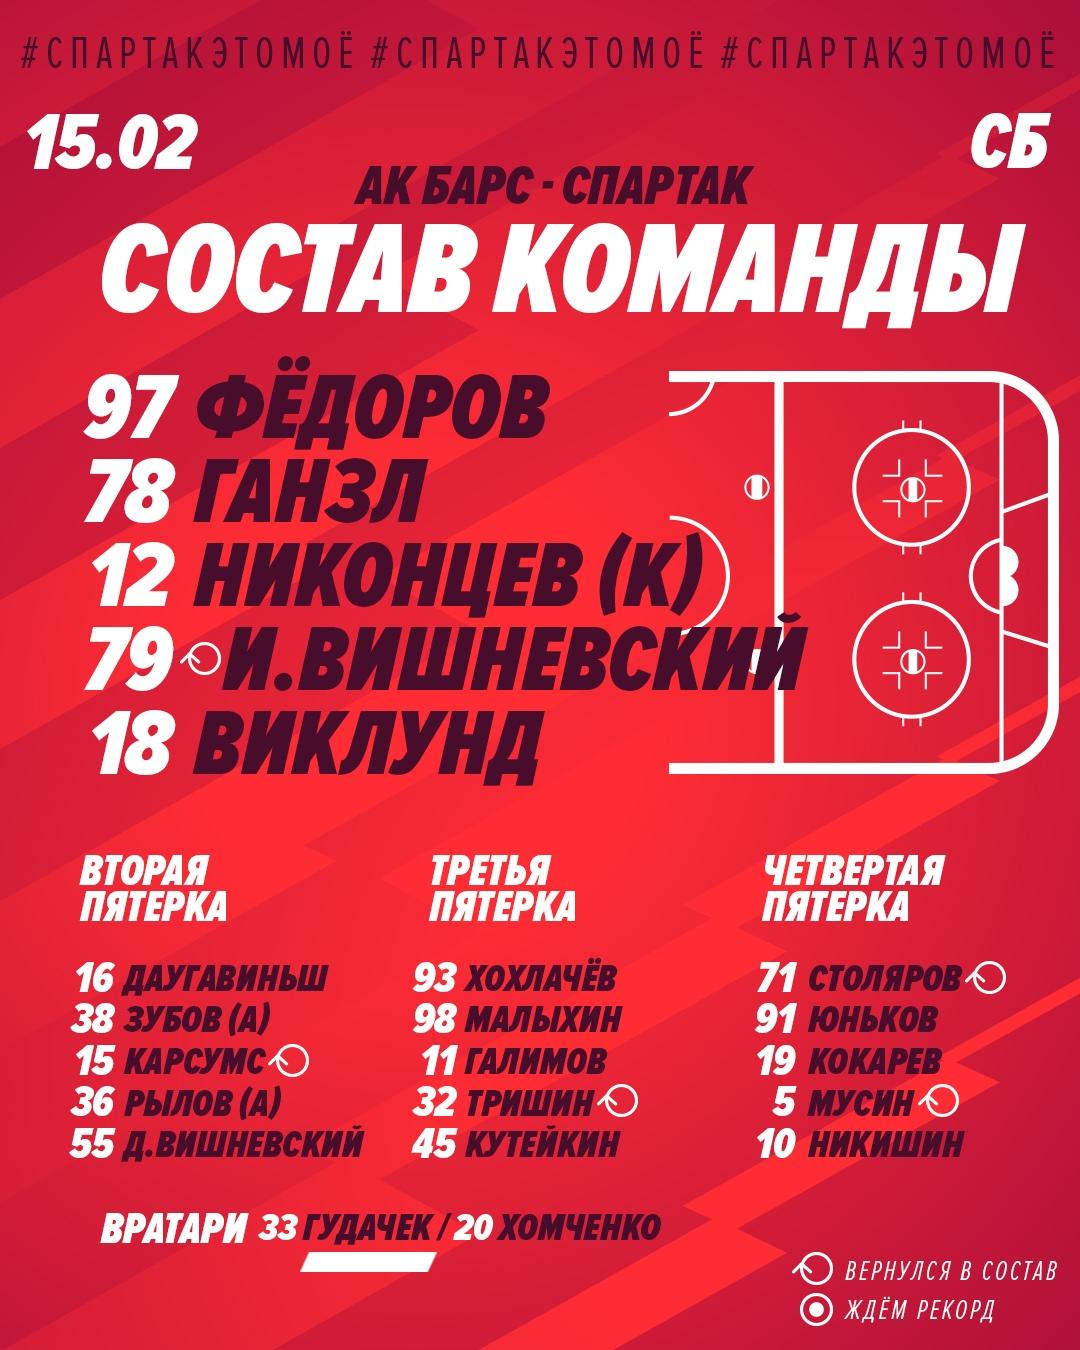 Состав «Спартака» на матч с «Ак Барсом»